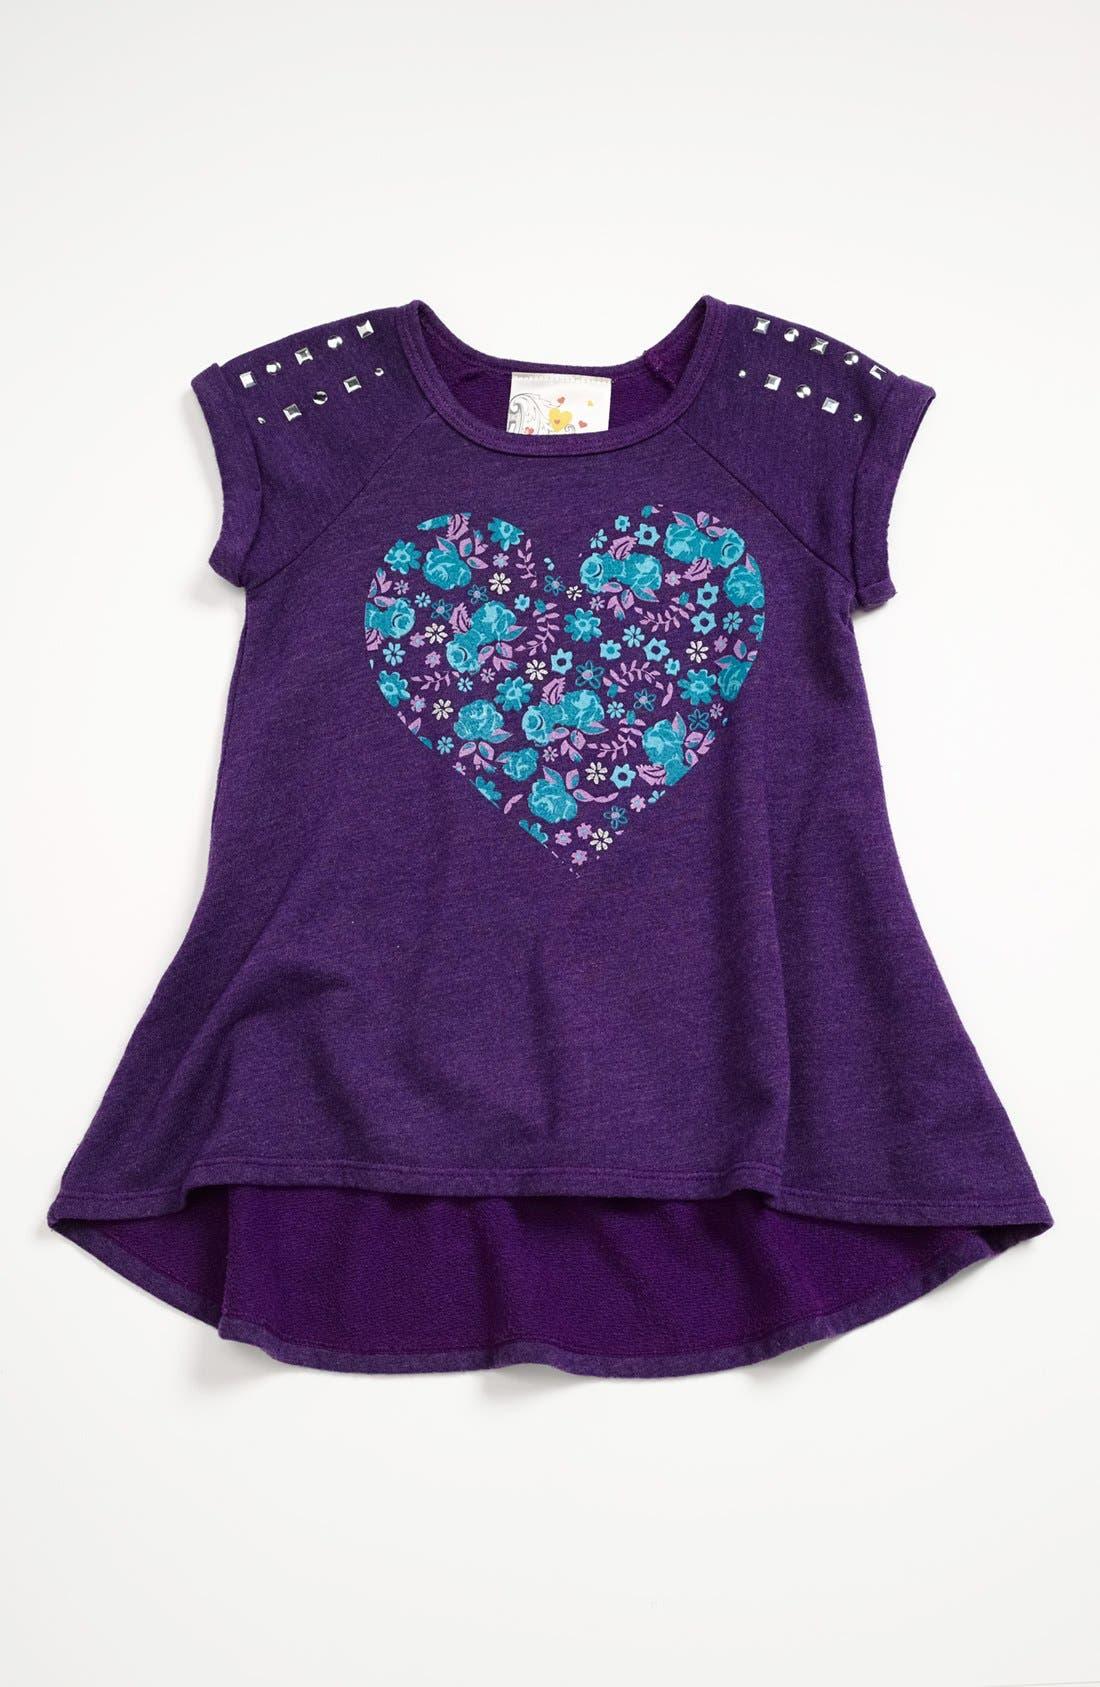 Alternate Image 1 Selected - Jenna & Jessie 'Heart' Fleece Top (Little Girls)